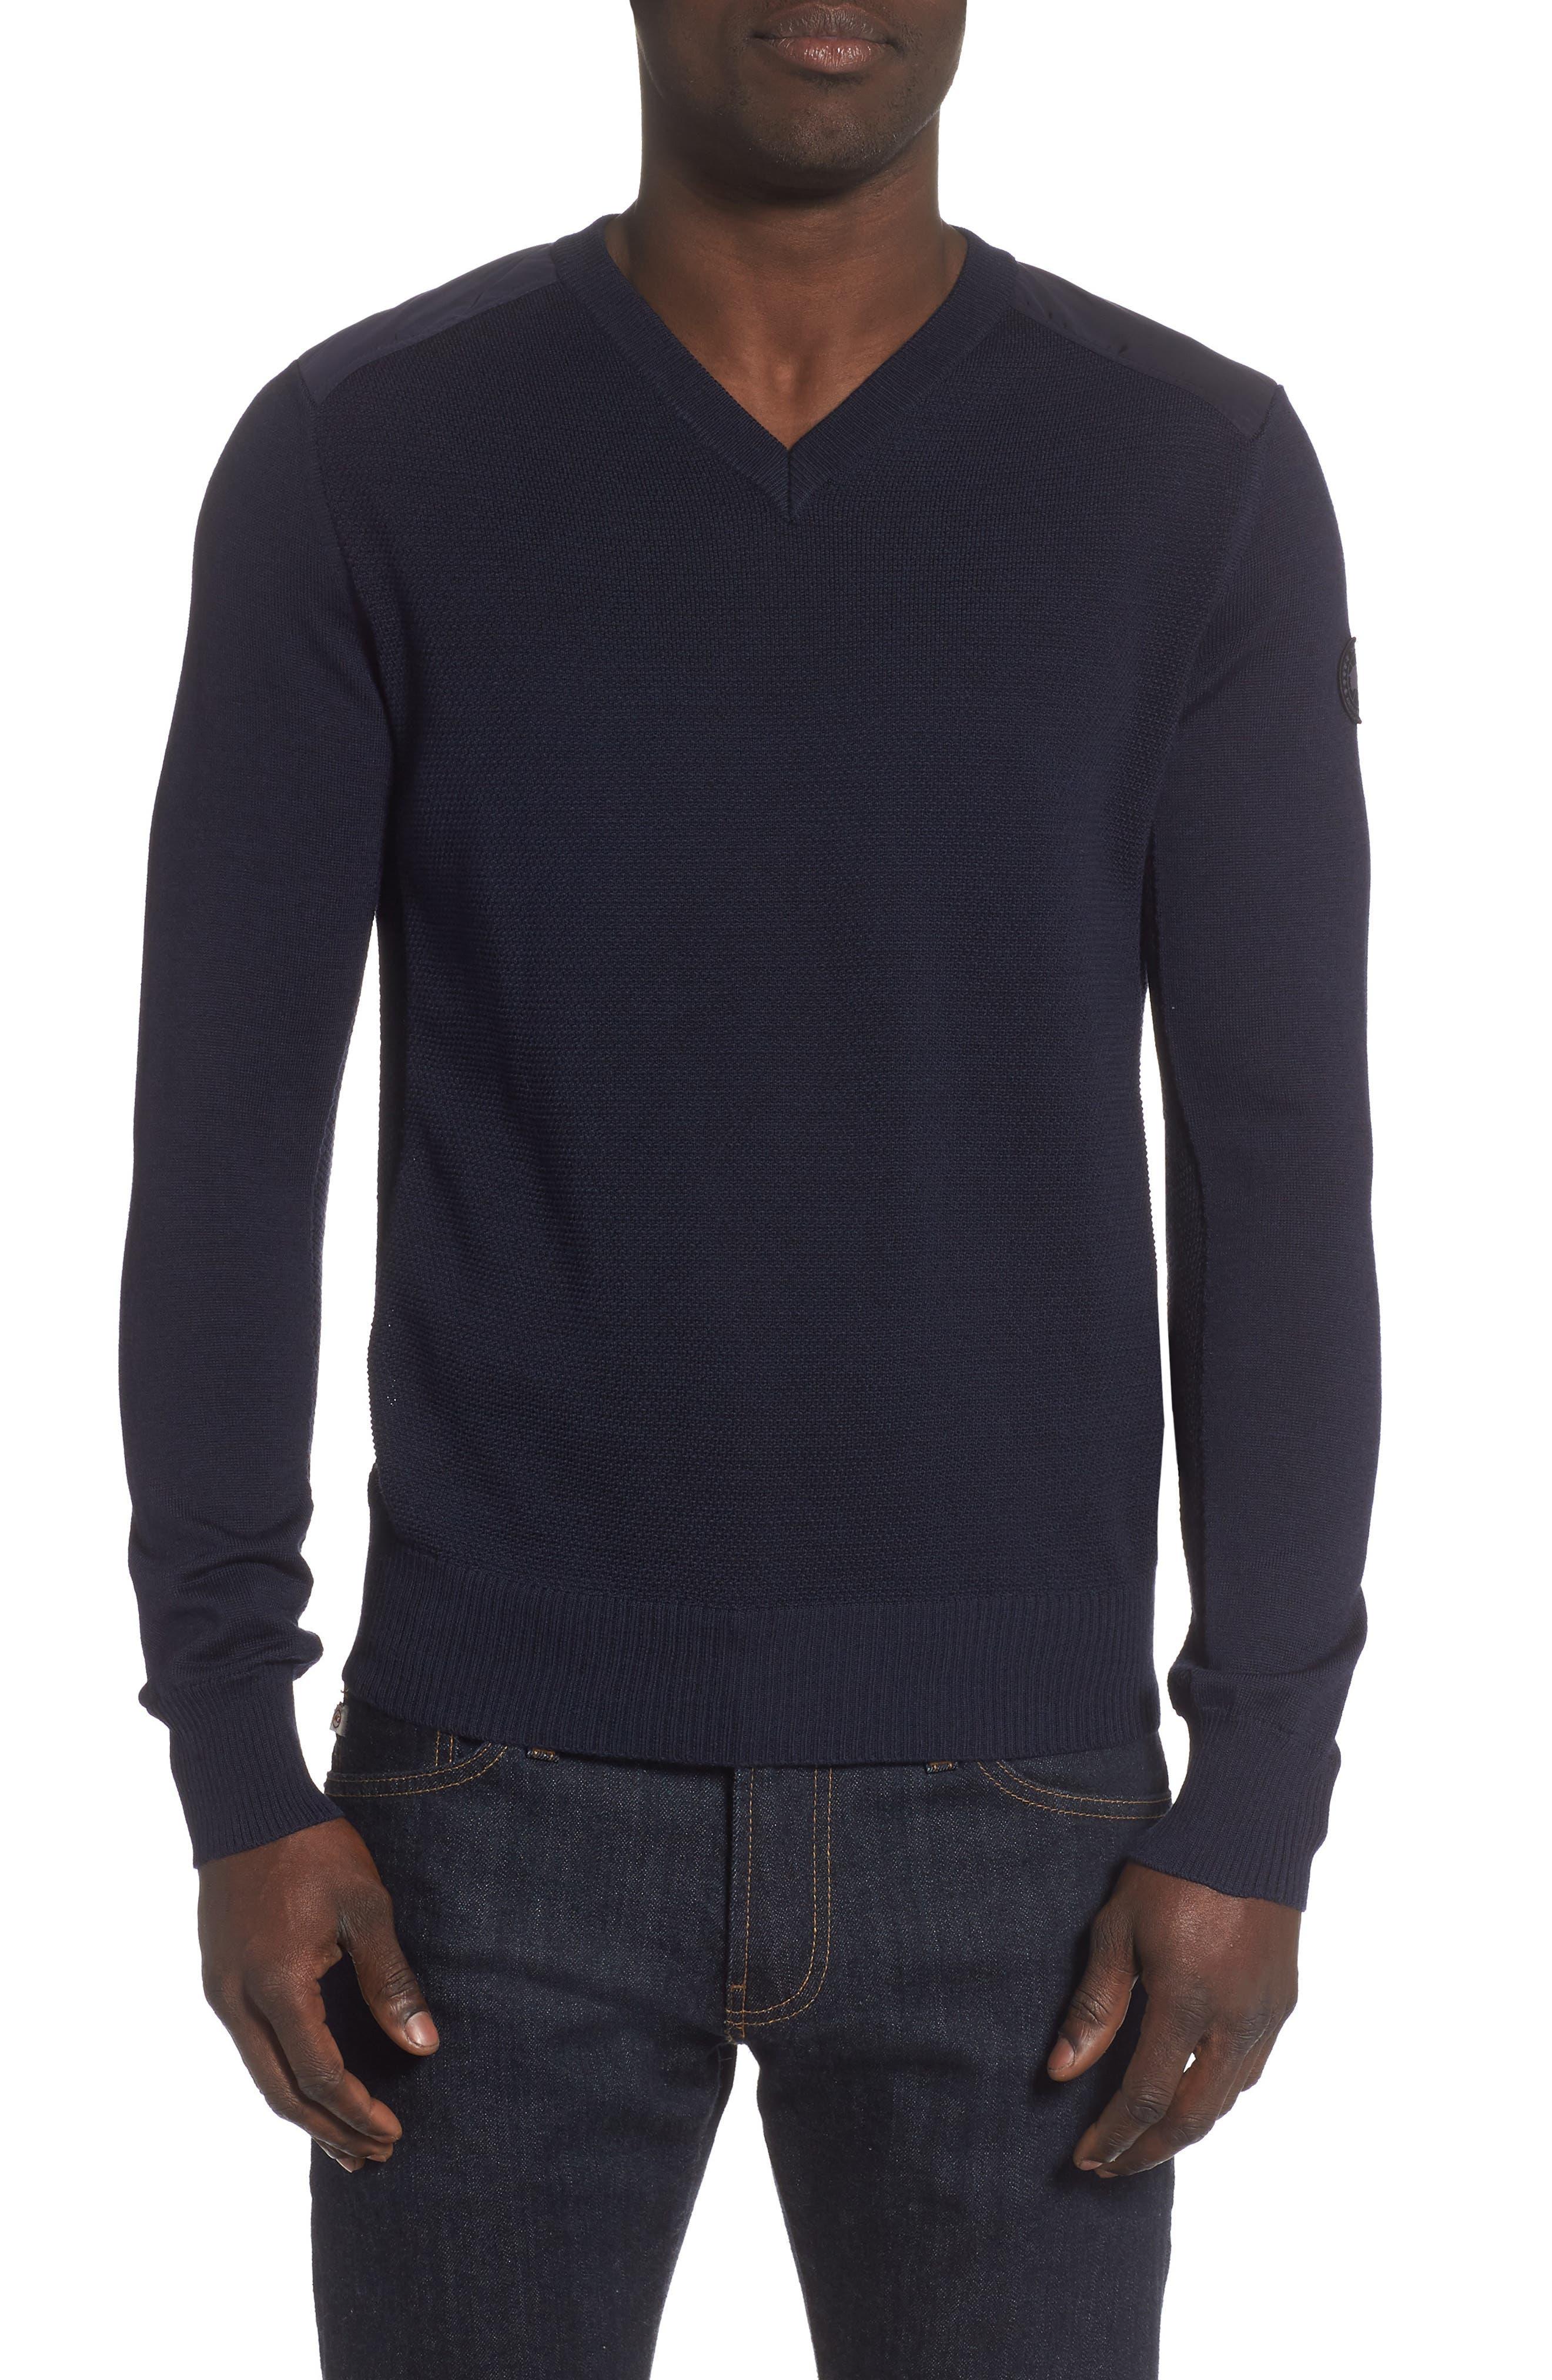 Canada Goose Mcleod V-Neck Regular Fit Merino Wool Sweater, Blue